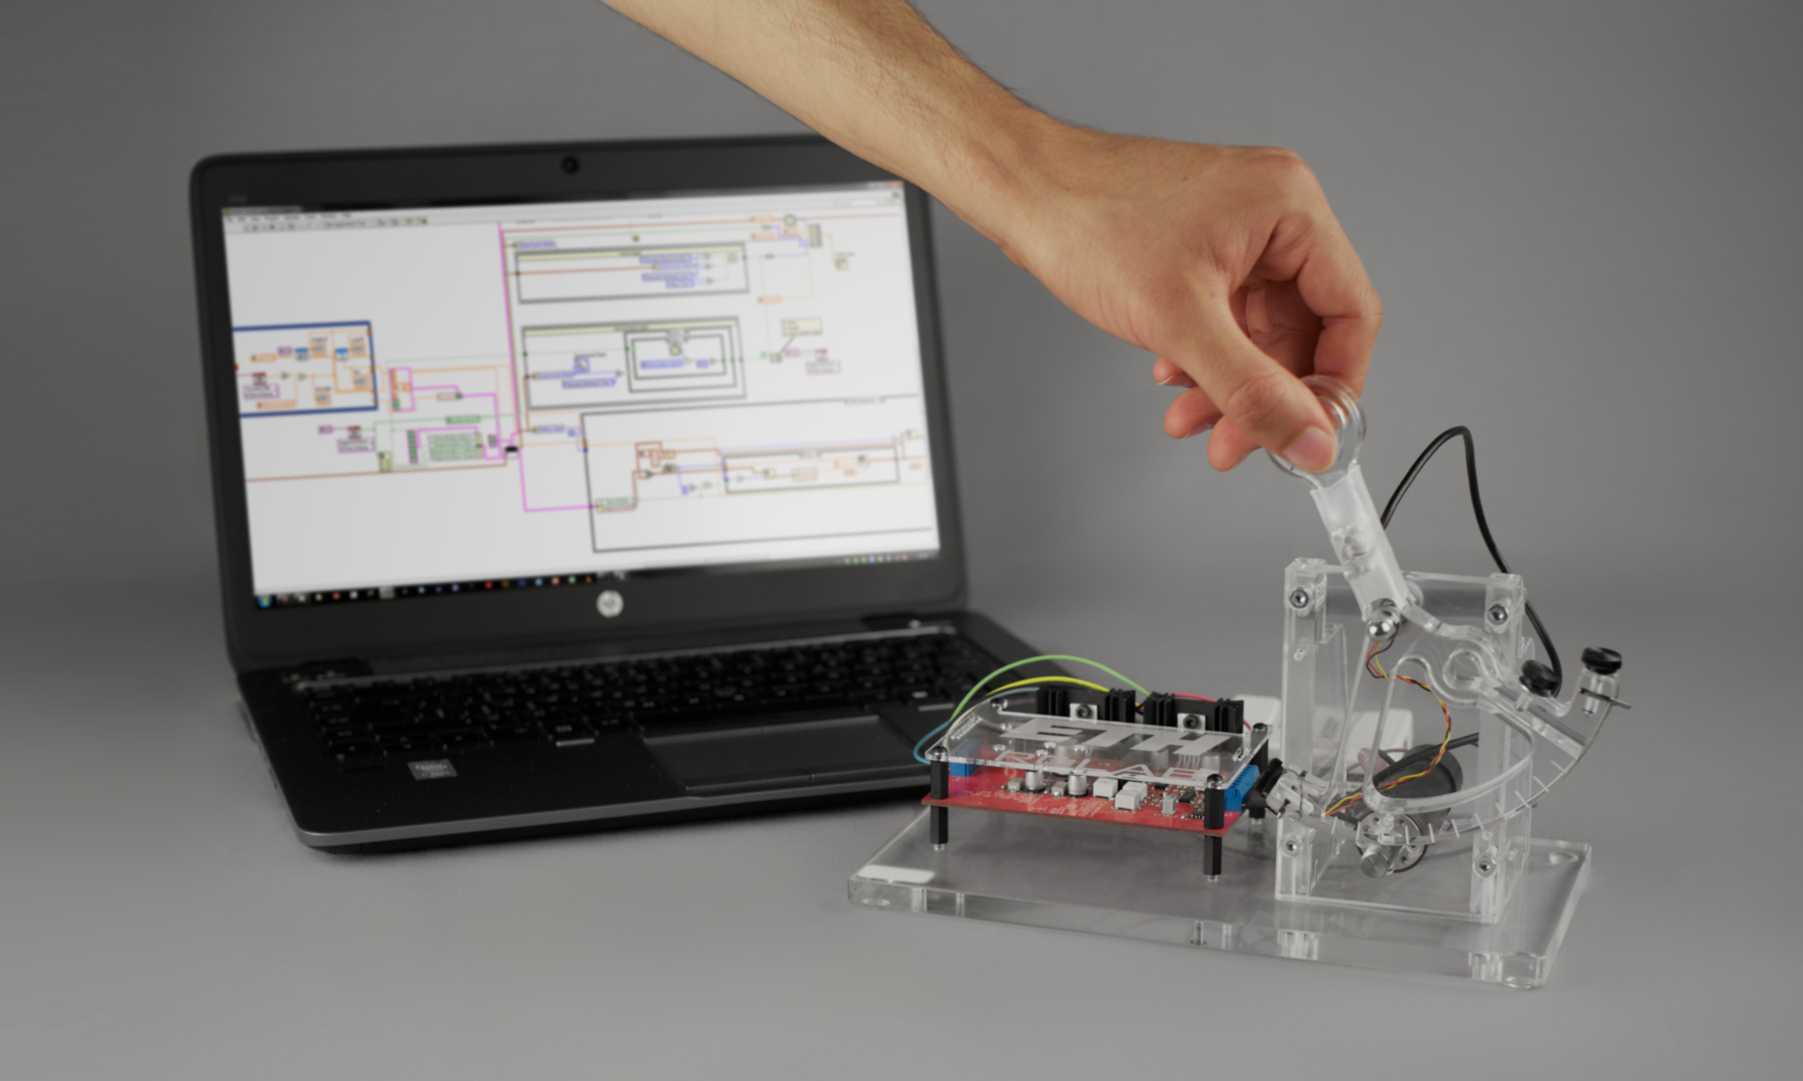 Physical Human Robot Interaction (pHRI) (376-1504-00L